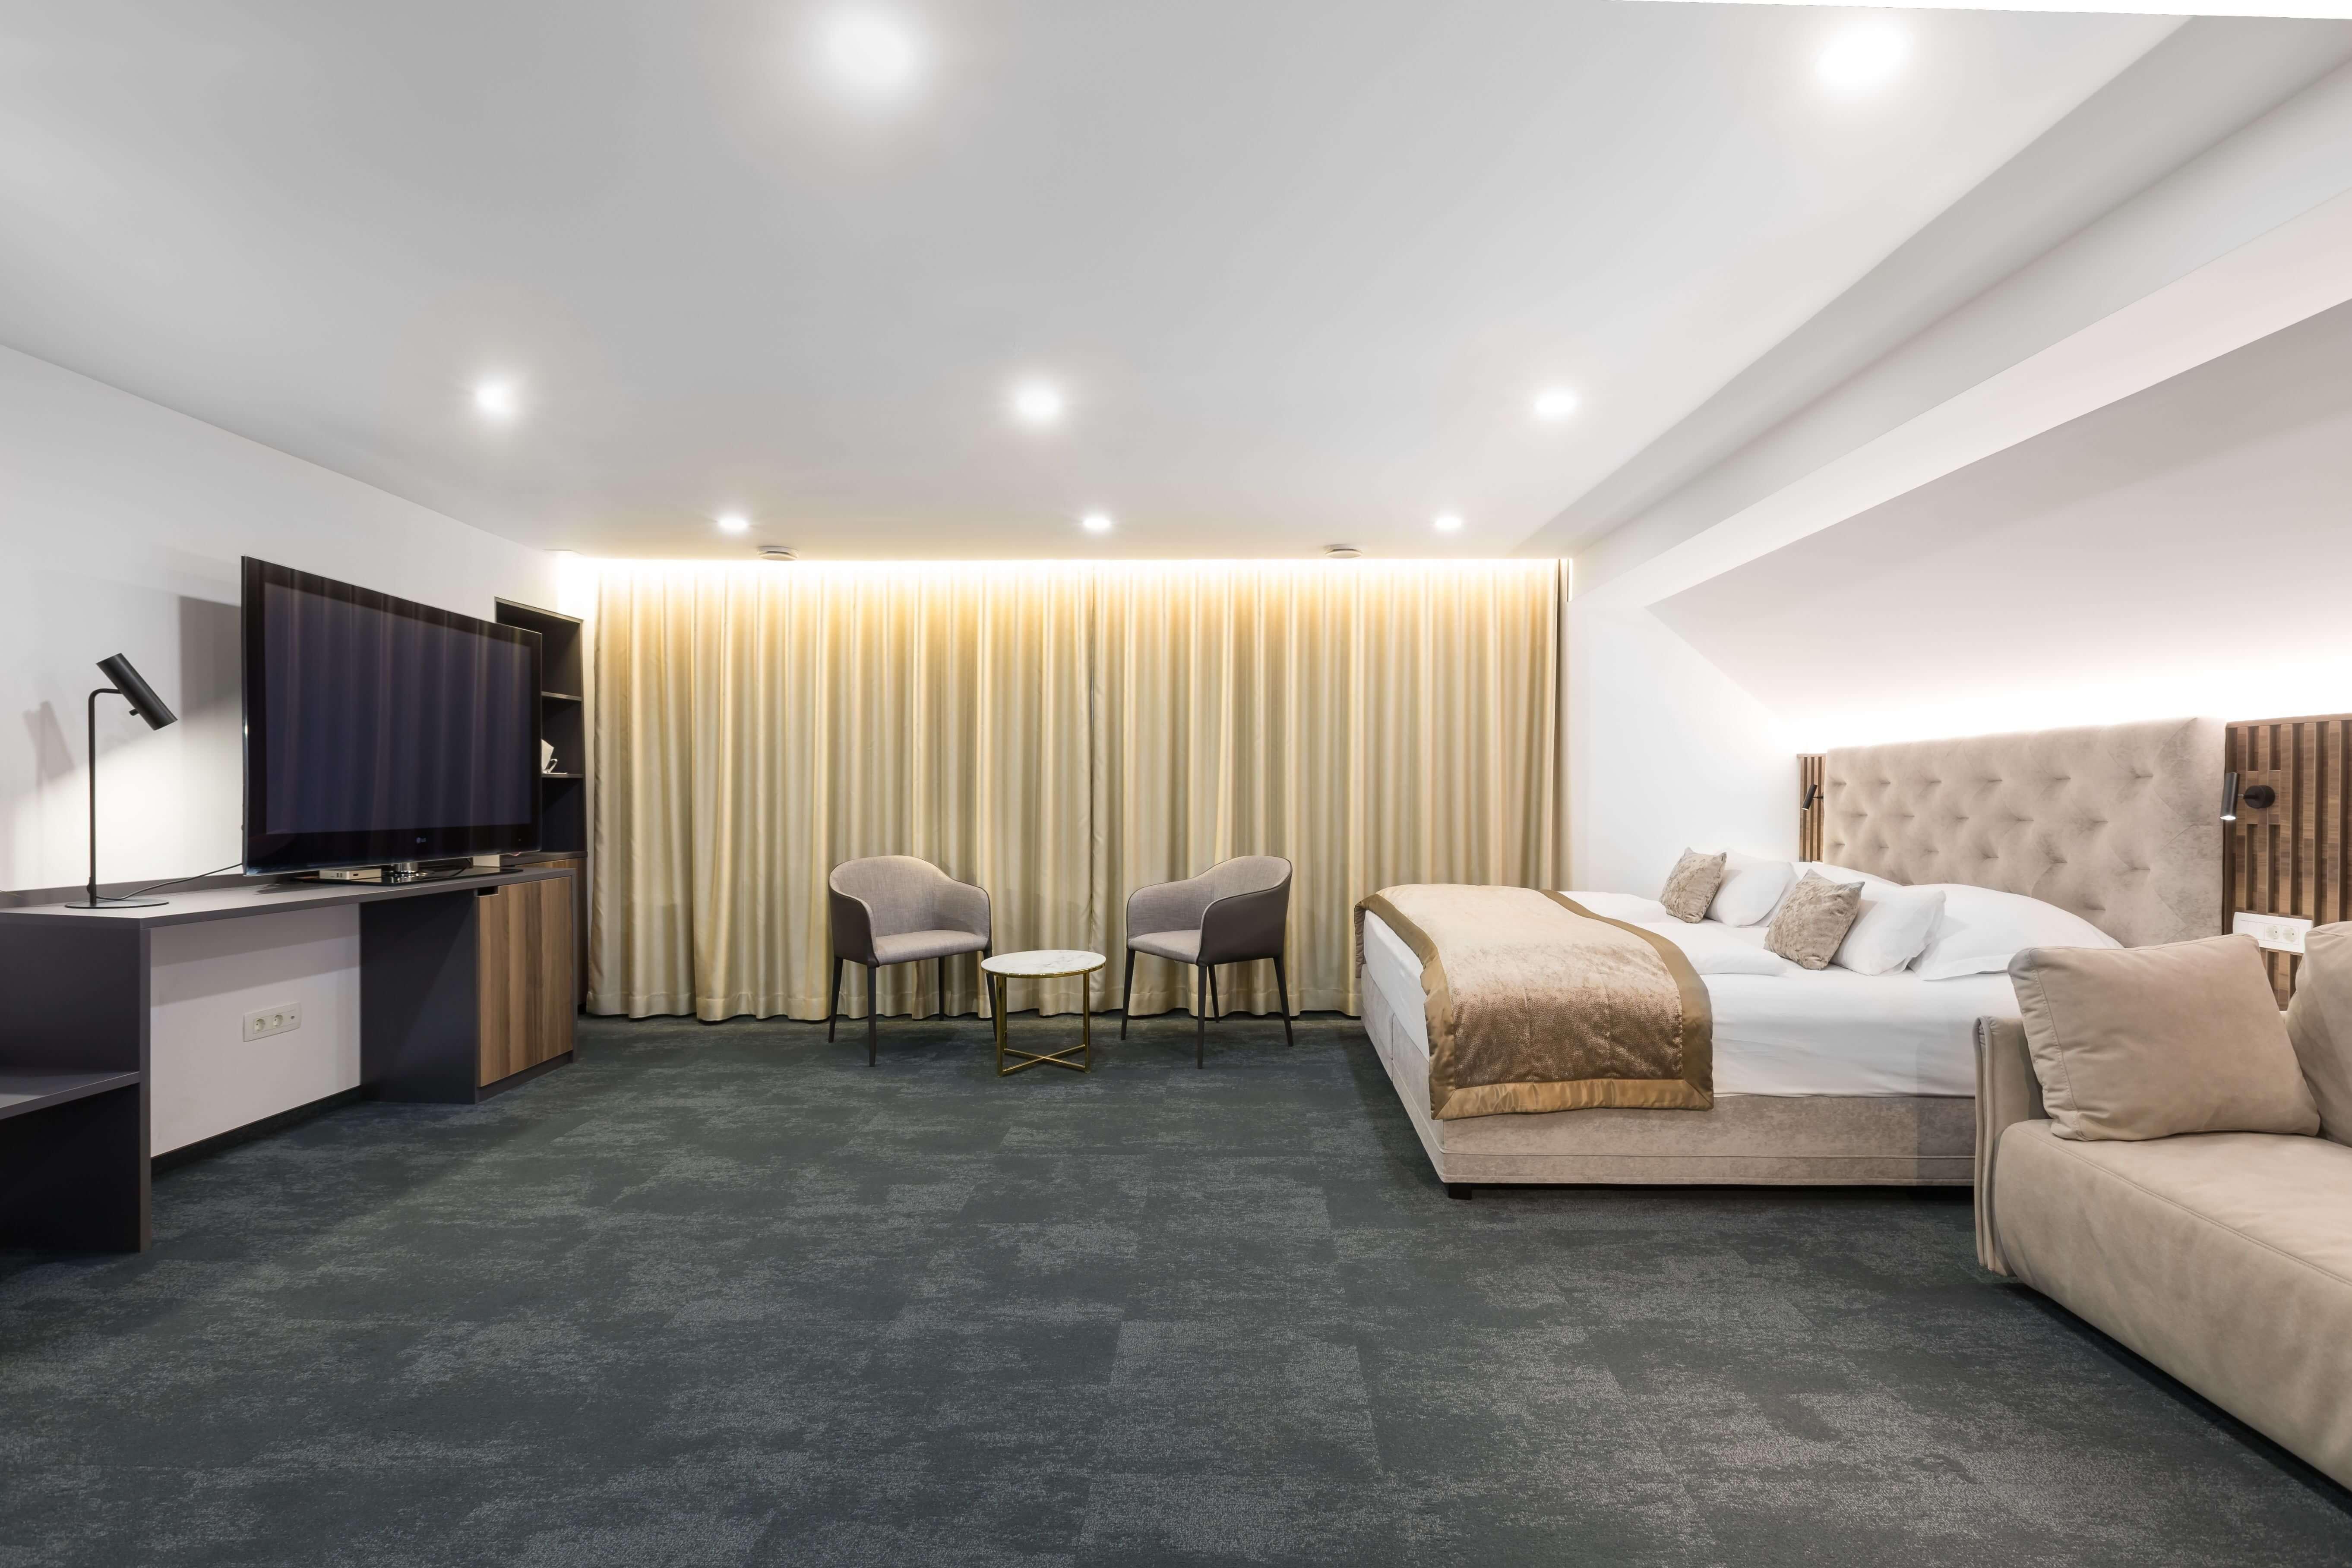 photodune-200546-hotel-bed-with-bathrobe-m-700x480